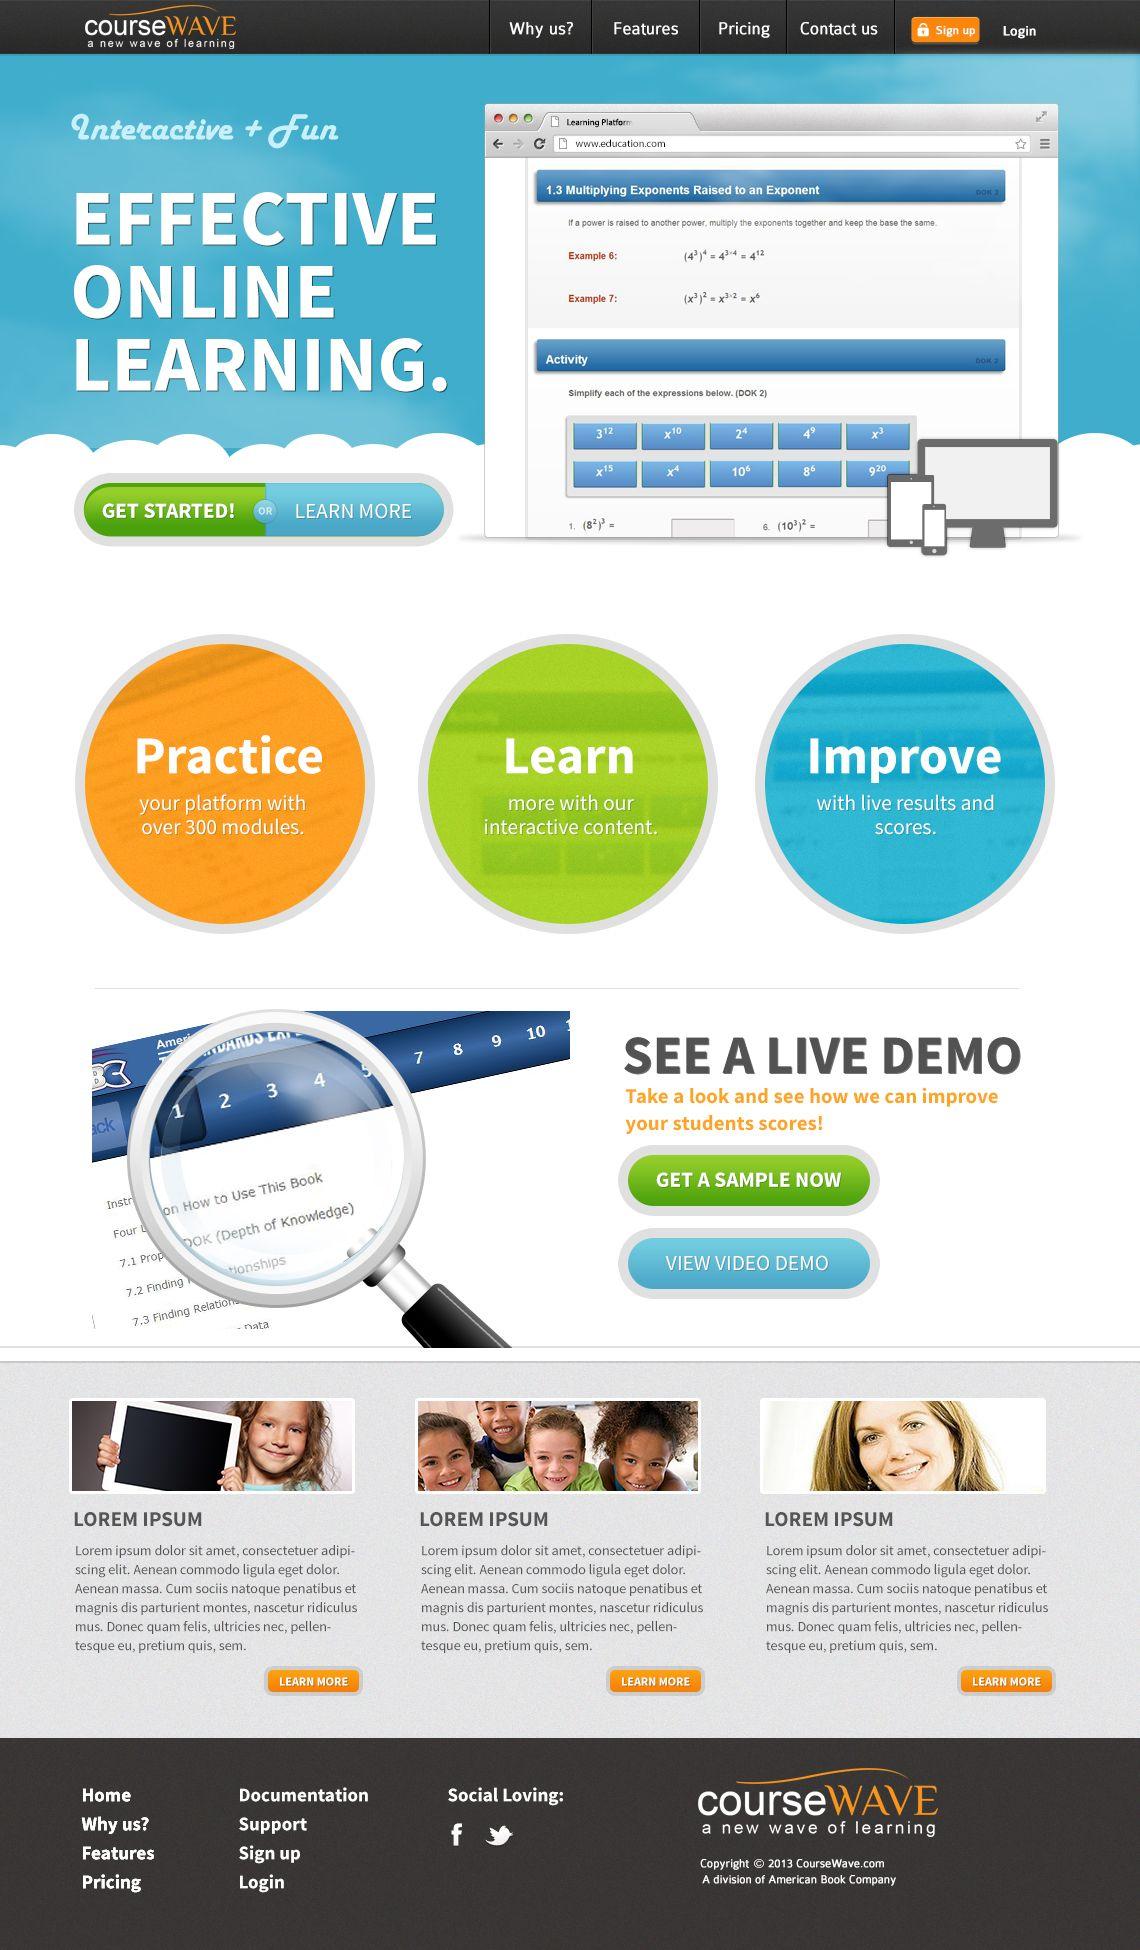 Course Wave Mock Up 3 Online Learning Website Design Improve Yourself